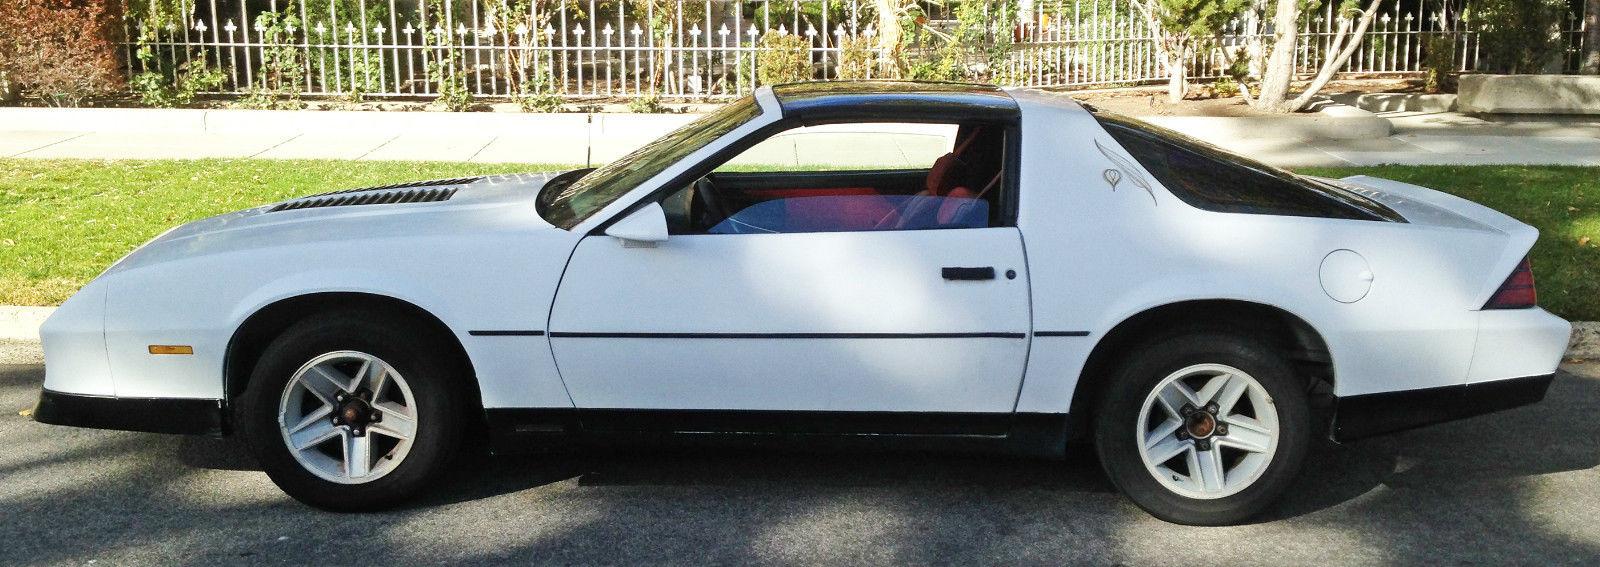 Chevrolet Camaro Z28 Sport 1985 Classic Chevrolet Camaro